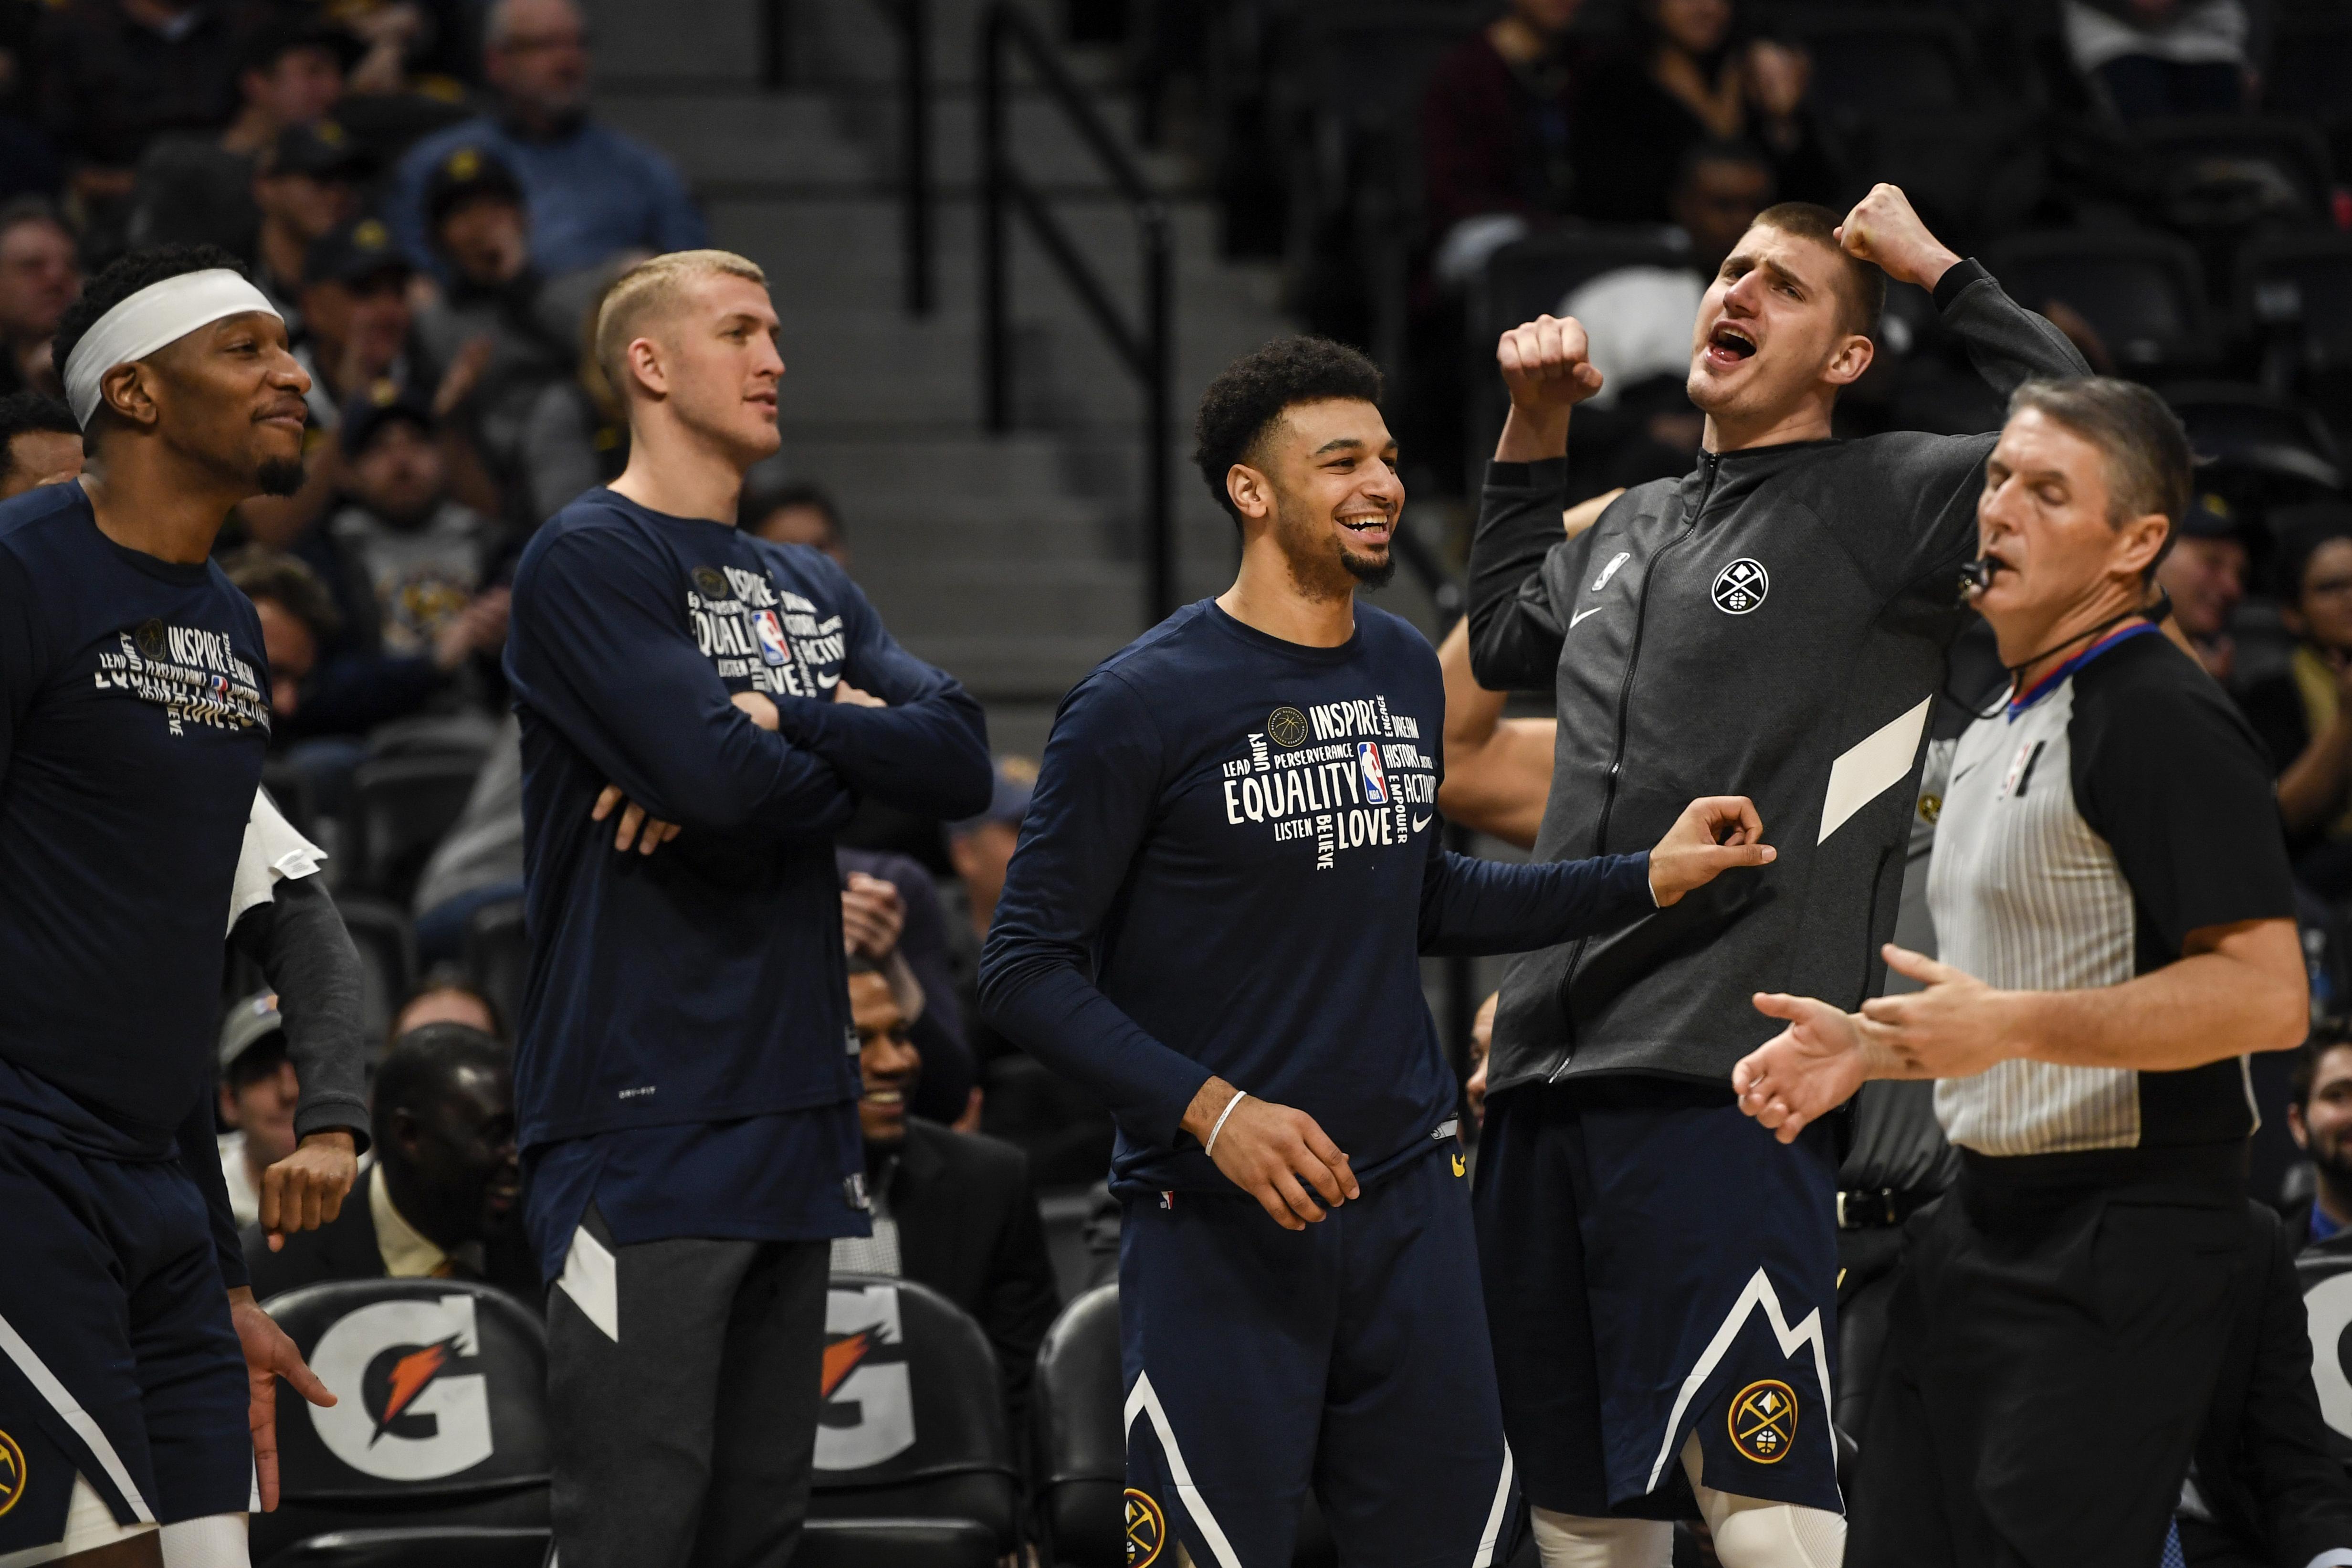 DENVER NUGGETS VS PORTLAND TRAIL BLAZERS, NBA REGULAR SEASON